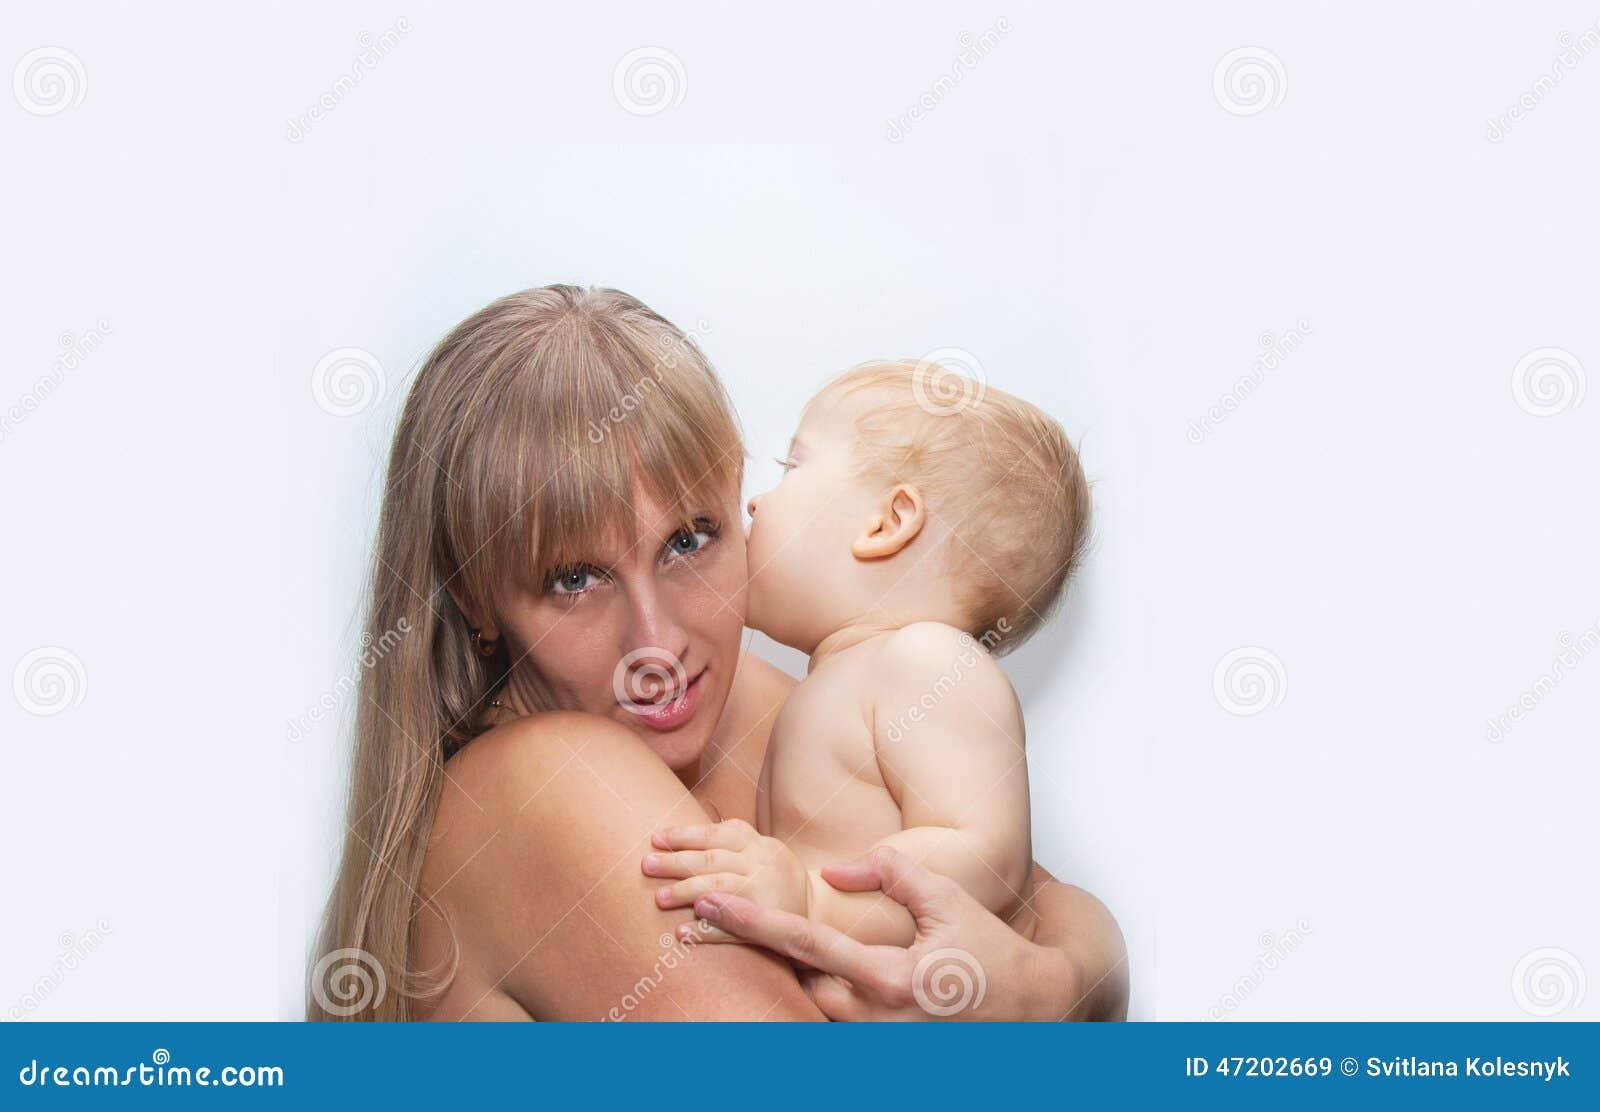 Baby küsst Mama